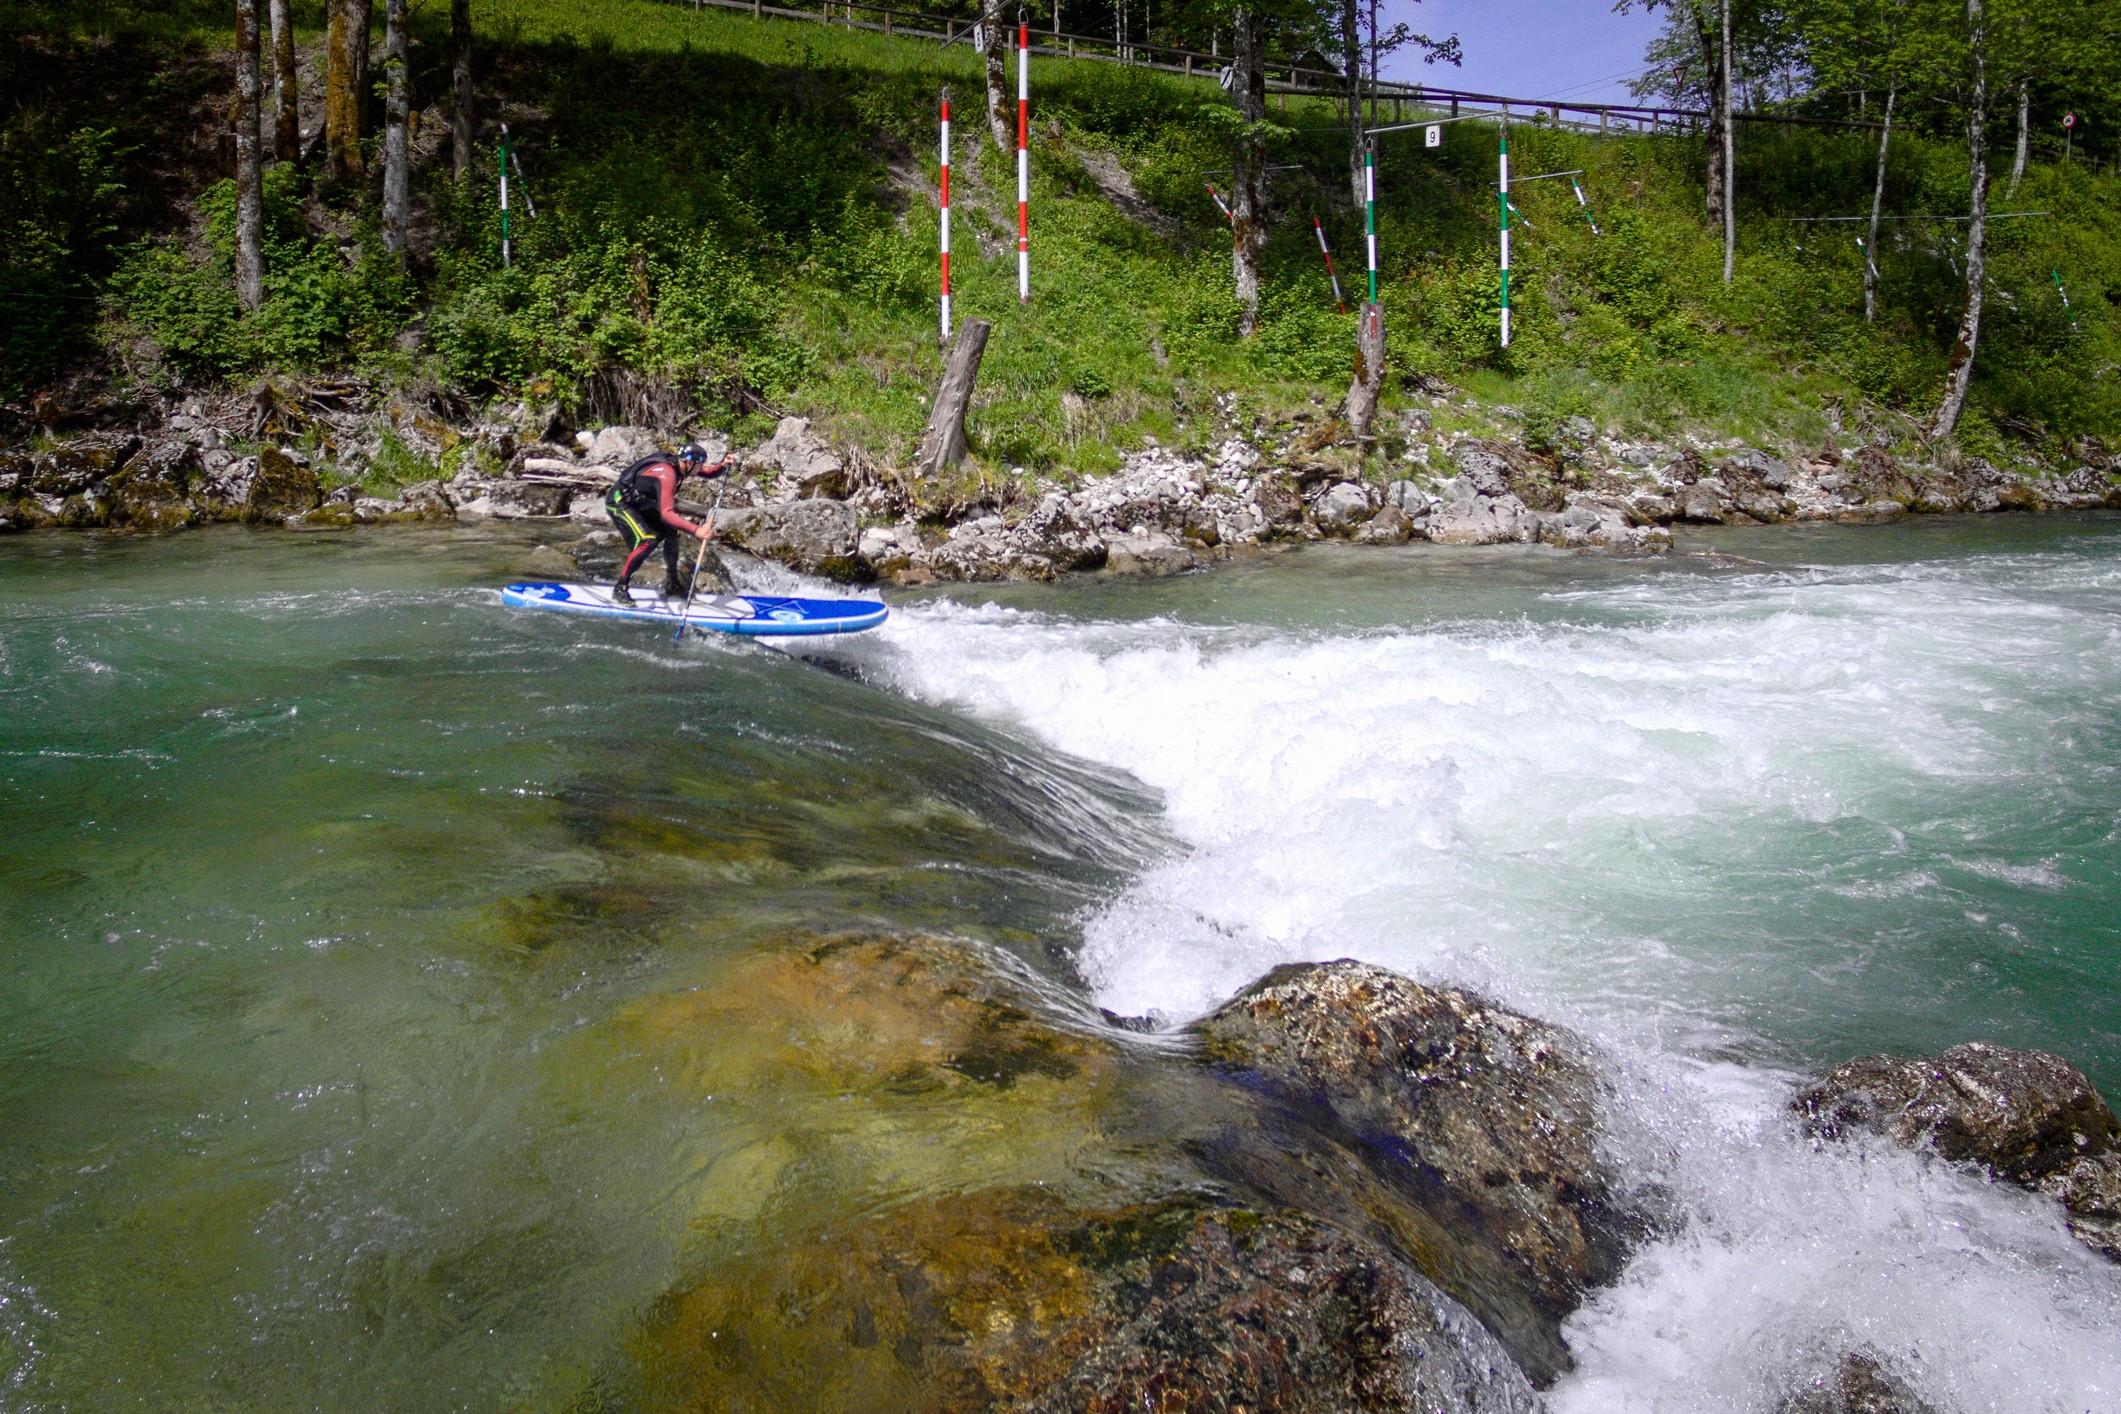 Rakousko: Slalomová trať ve Wildalpenu